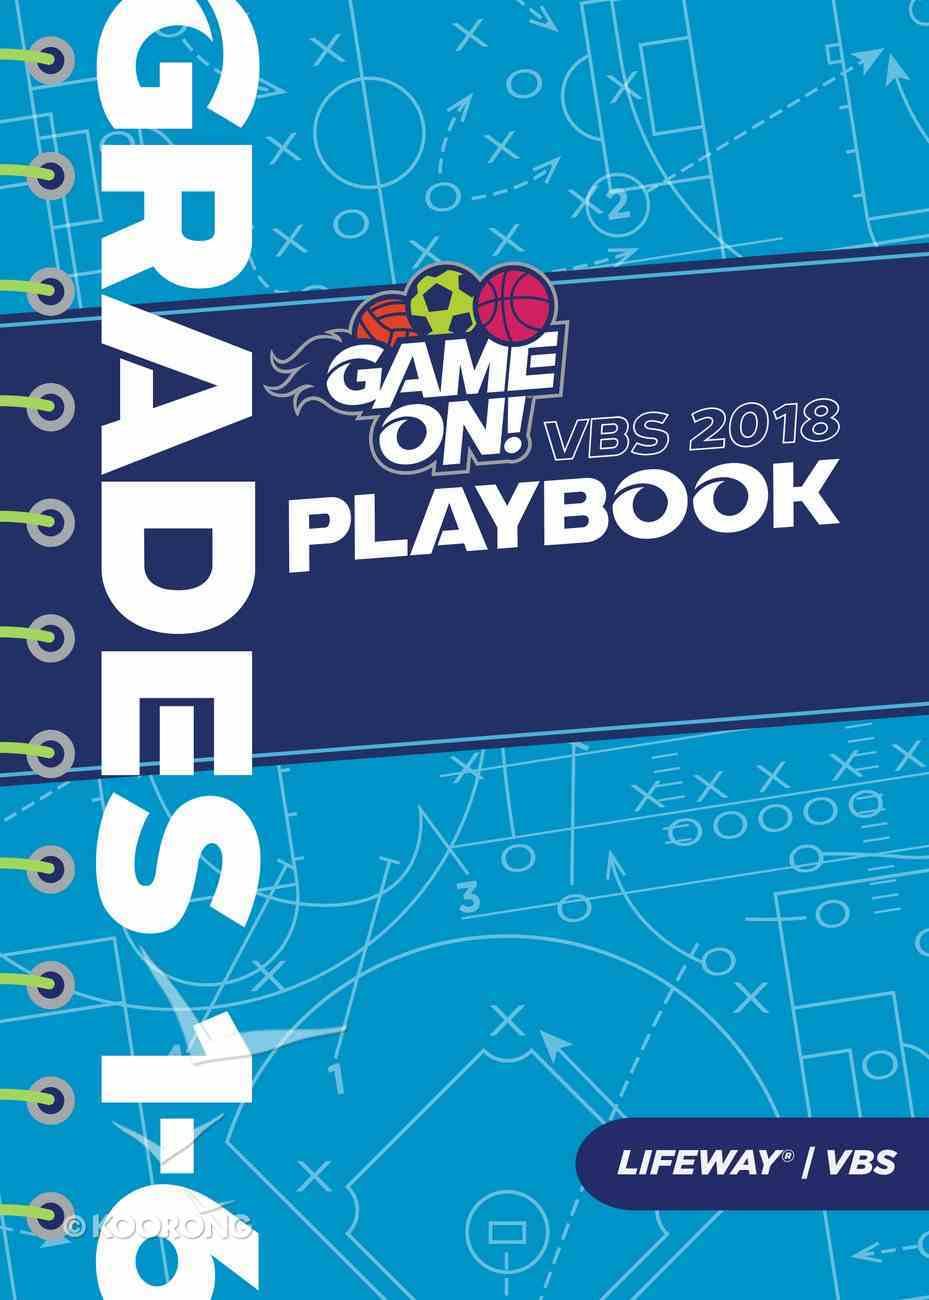 Grades 1-6 (Playbook) (Vbs 2018 Game On! Series) Paperback